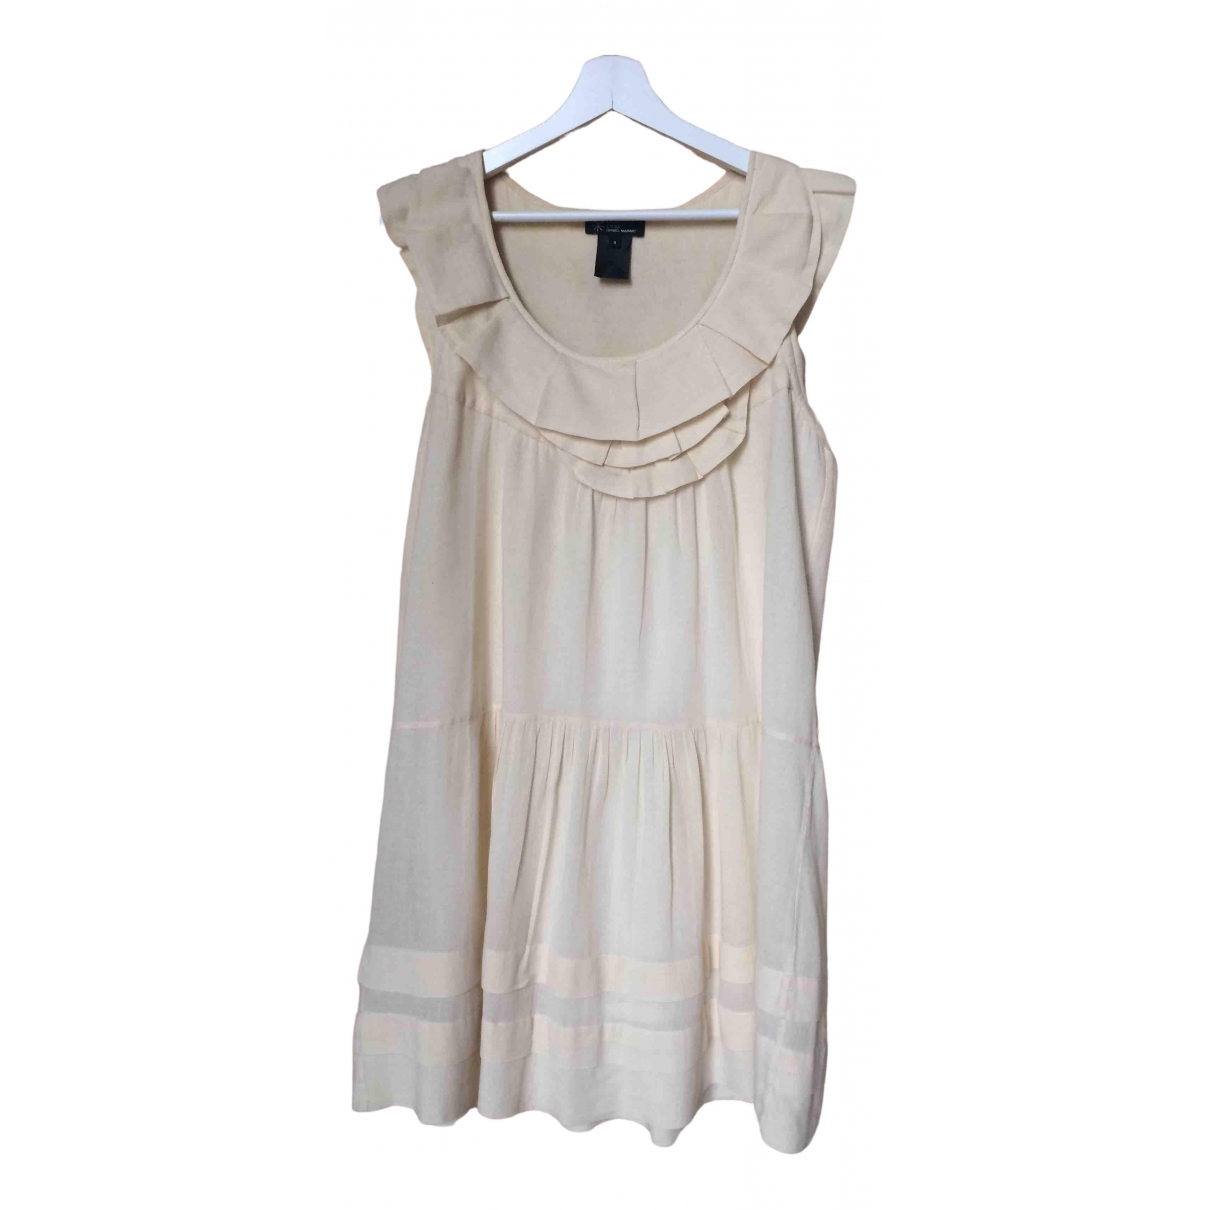 Isabel Marant Etoile \N Ecru Cotton dress for Women 3 0-5